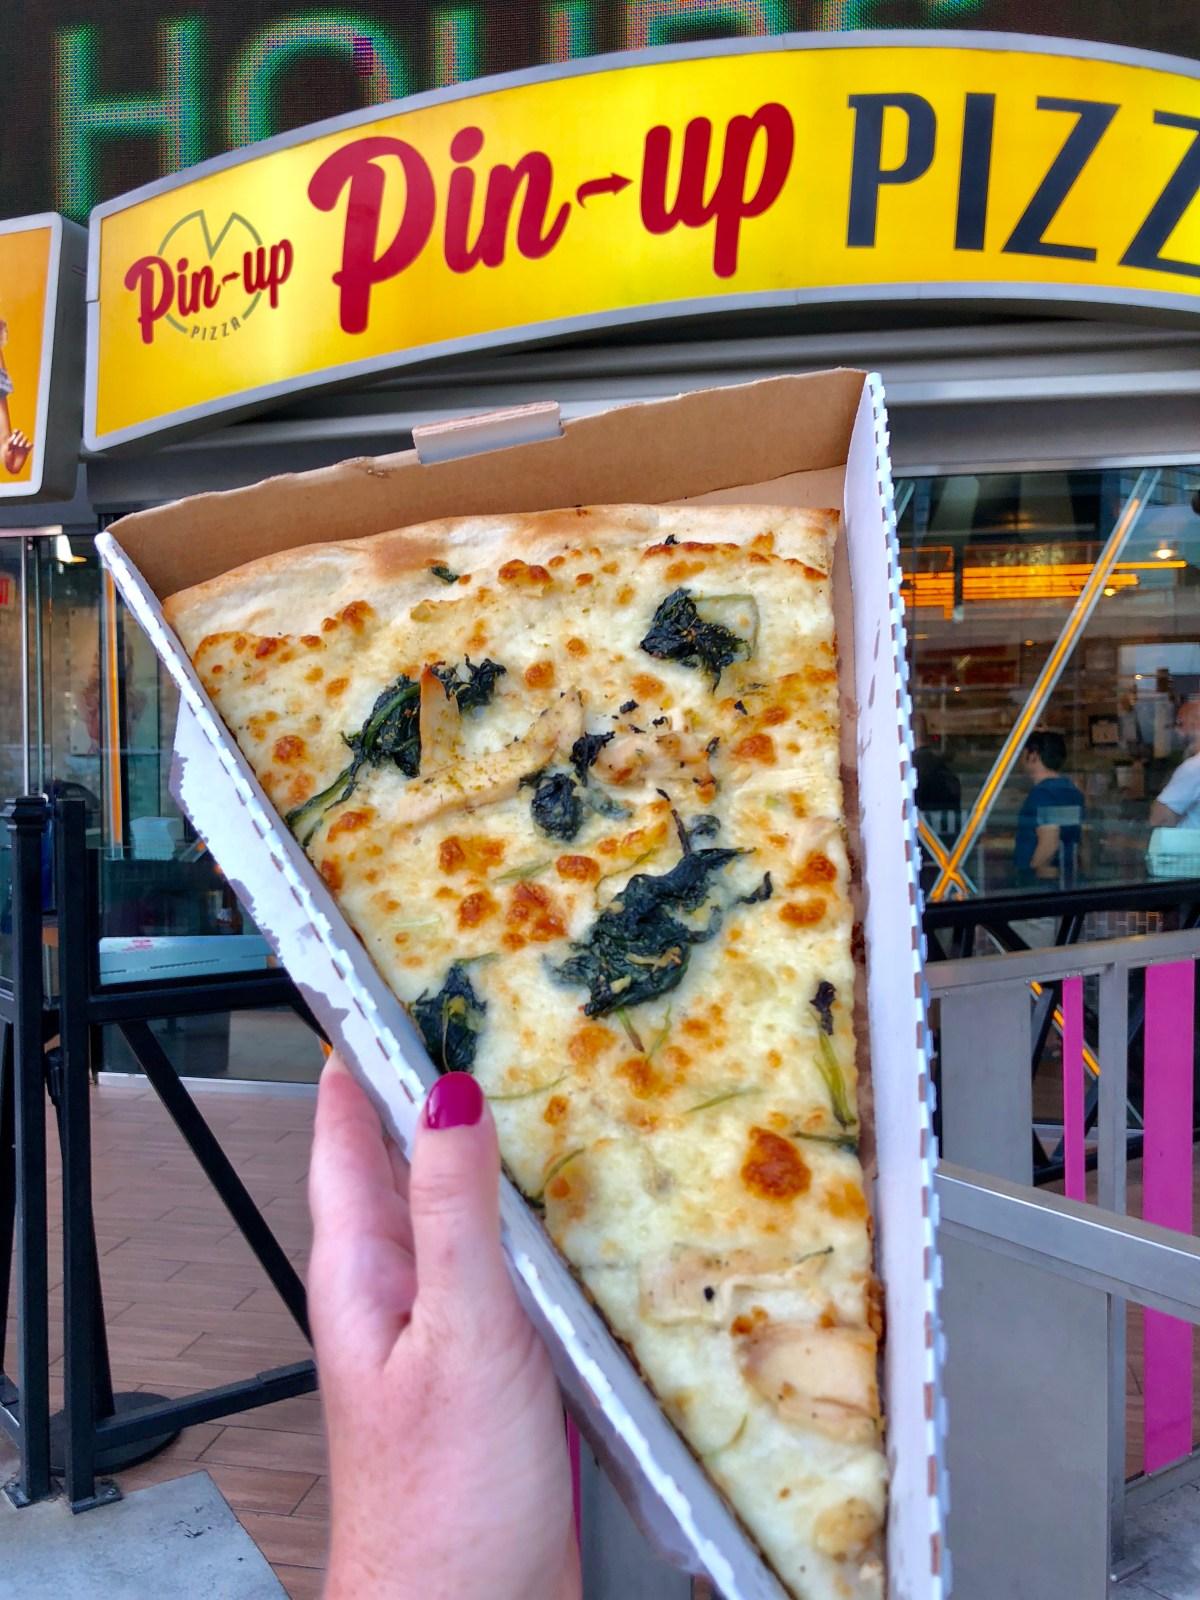 Pin-Up Pizza | Planet Hollywood #lasvegas #wheretoeatinvegas #giantpizzaslice #pizzalasvegas #pinuppizza